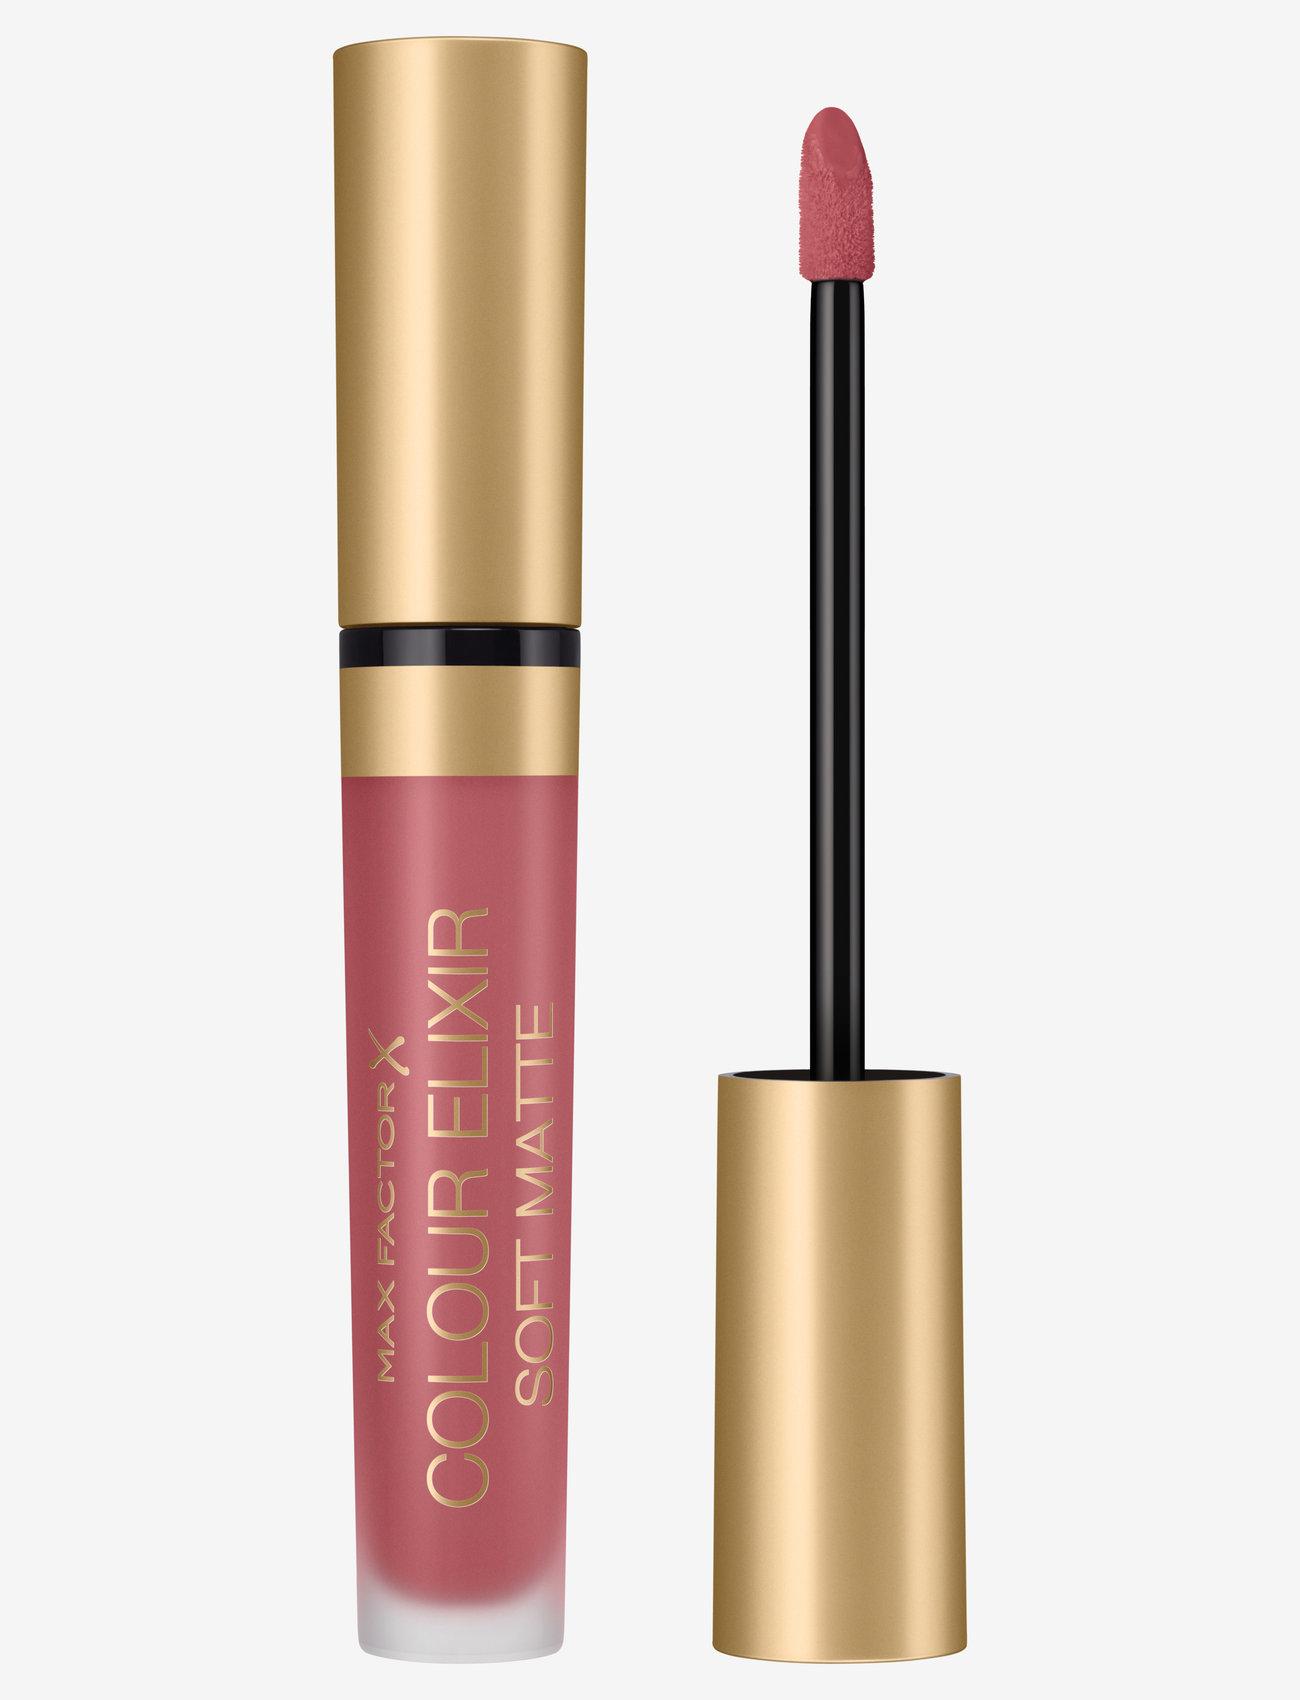 Max Factor - Color Elixir Soft Matte Lipstick 15 Rose Dust - läppstift - 15 rose dust - 0